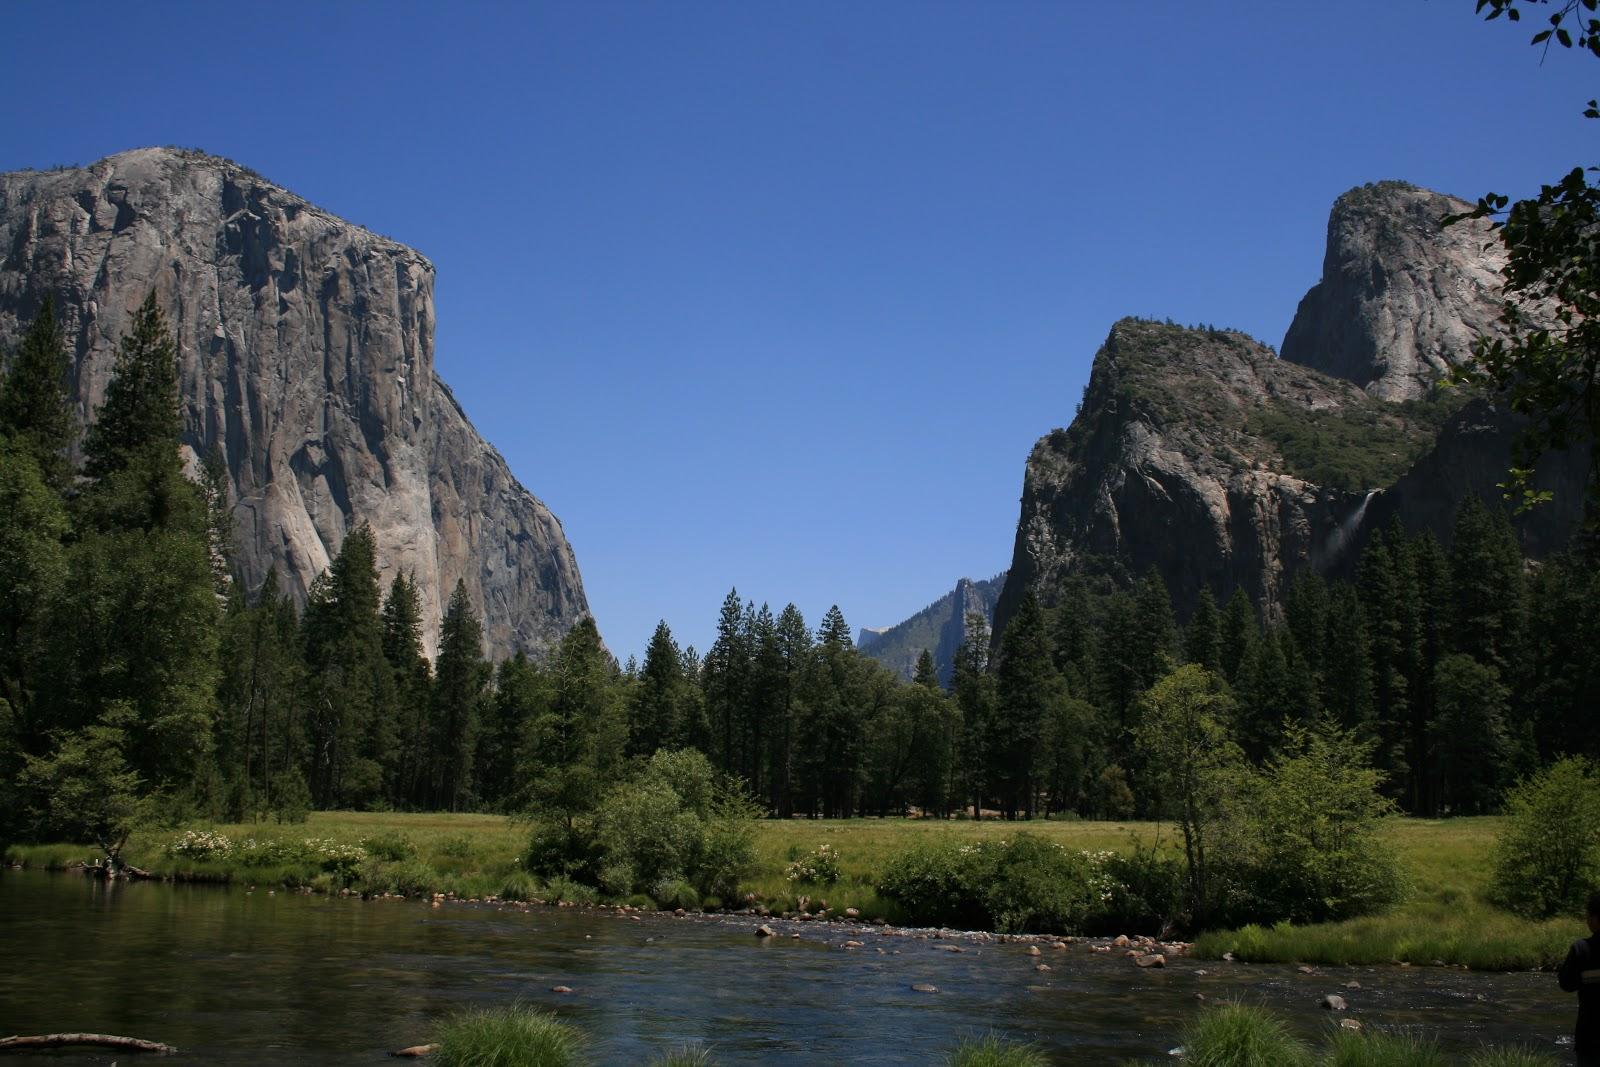 http://2.bp.blogspot.com/-a-w6YRgN-dE/UNaQZfzqZWI/AAAAAAAAOZw/Vm0OQB2YYaw/s1600/Yosemite+valley,+California,+USA.+18.JPG